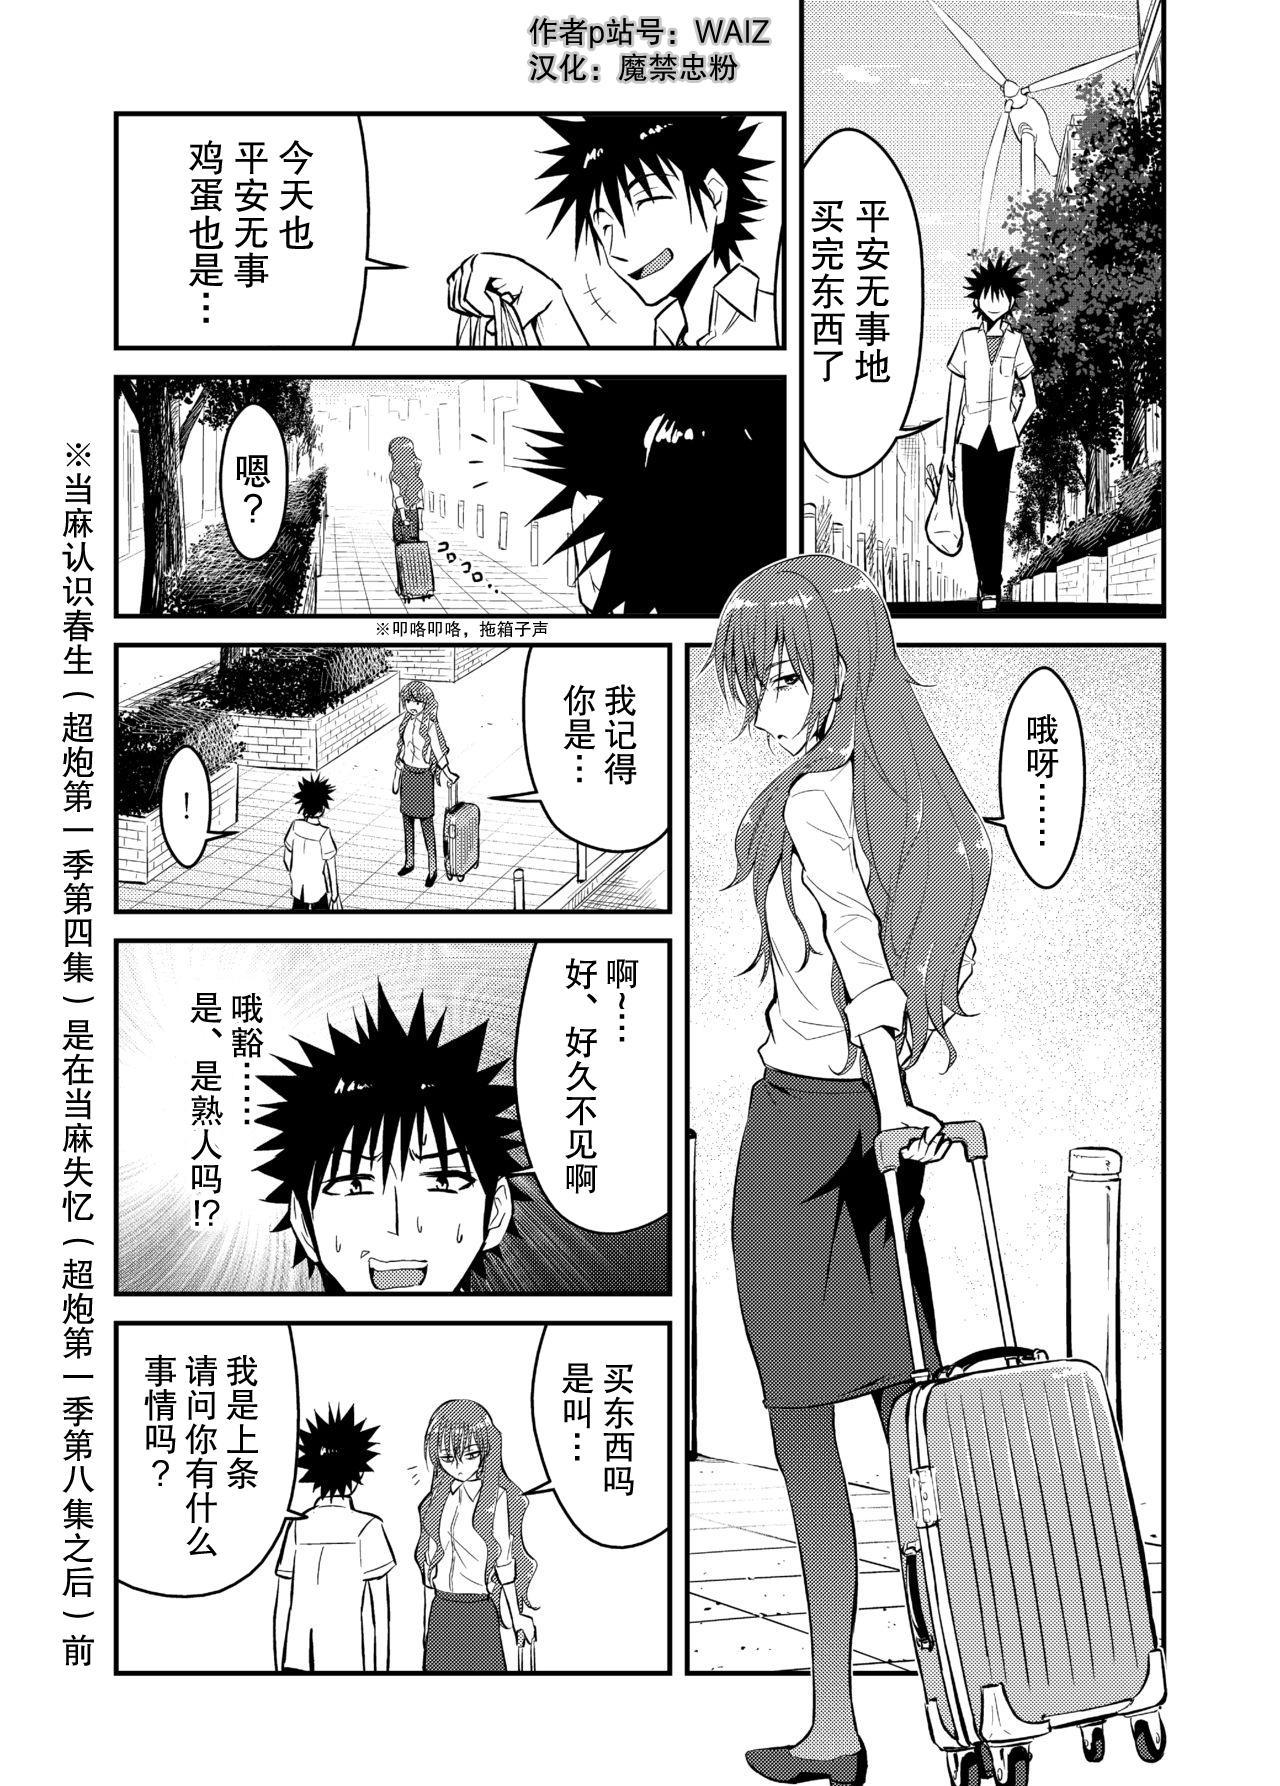 [WAIZ][同人个人渣汉化][就算是上条先生我家要住7个人还是太勉强了](Toaru Majutsu no Index) [中国翻译] 17